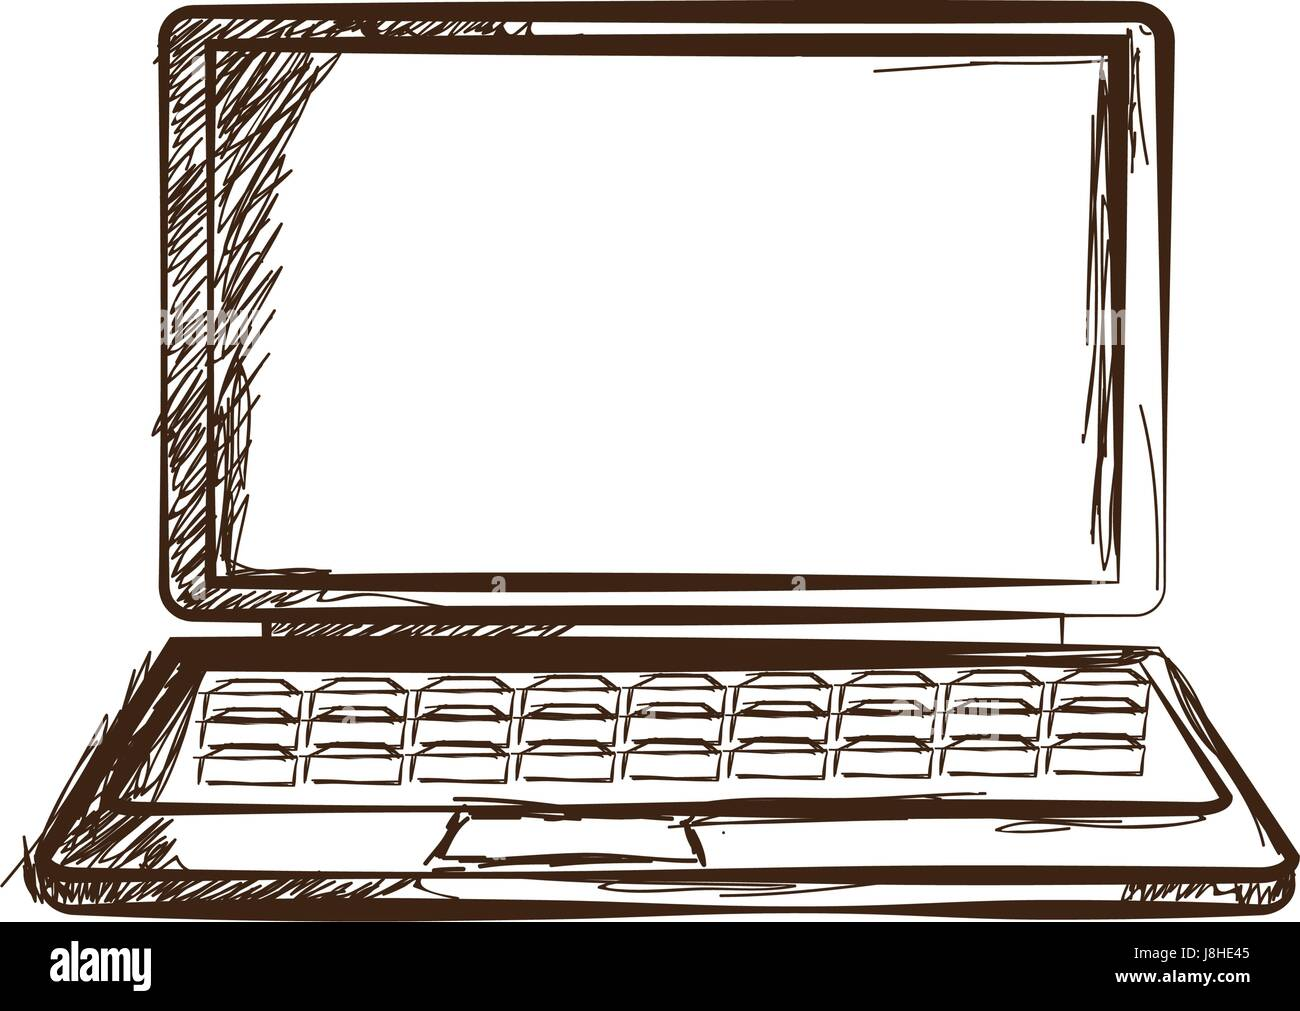 laptop hand drawn sketch doodle gadget engraved - Stock Image